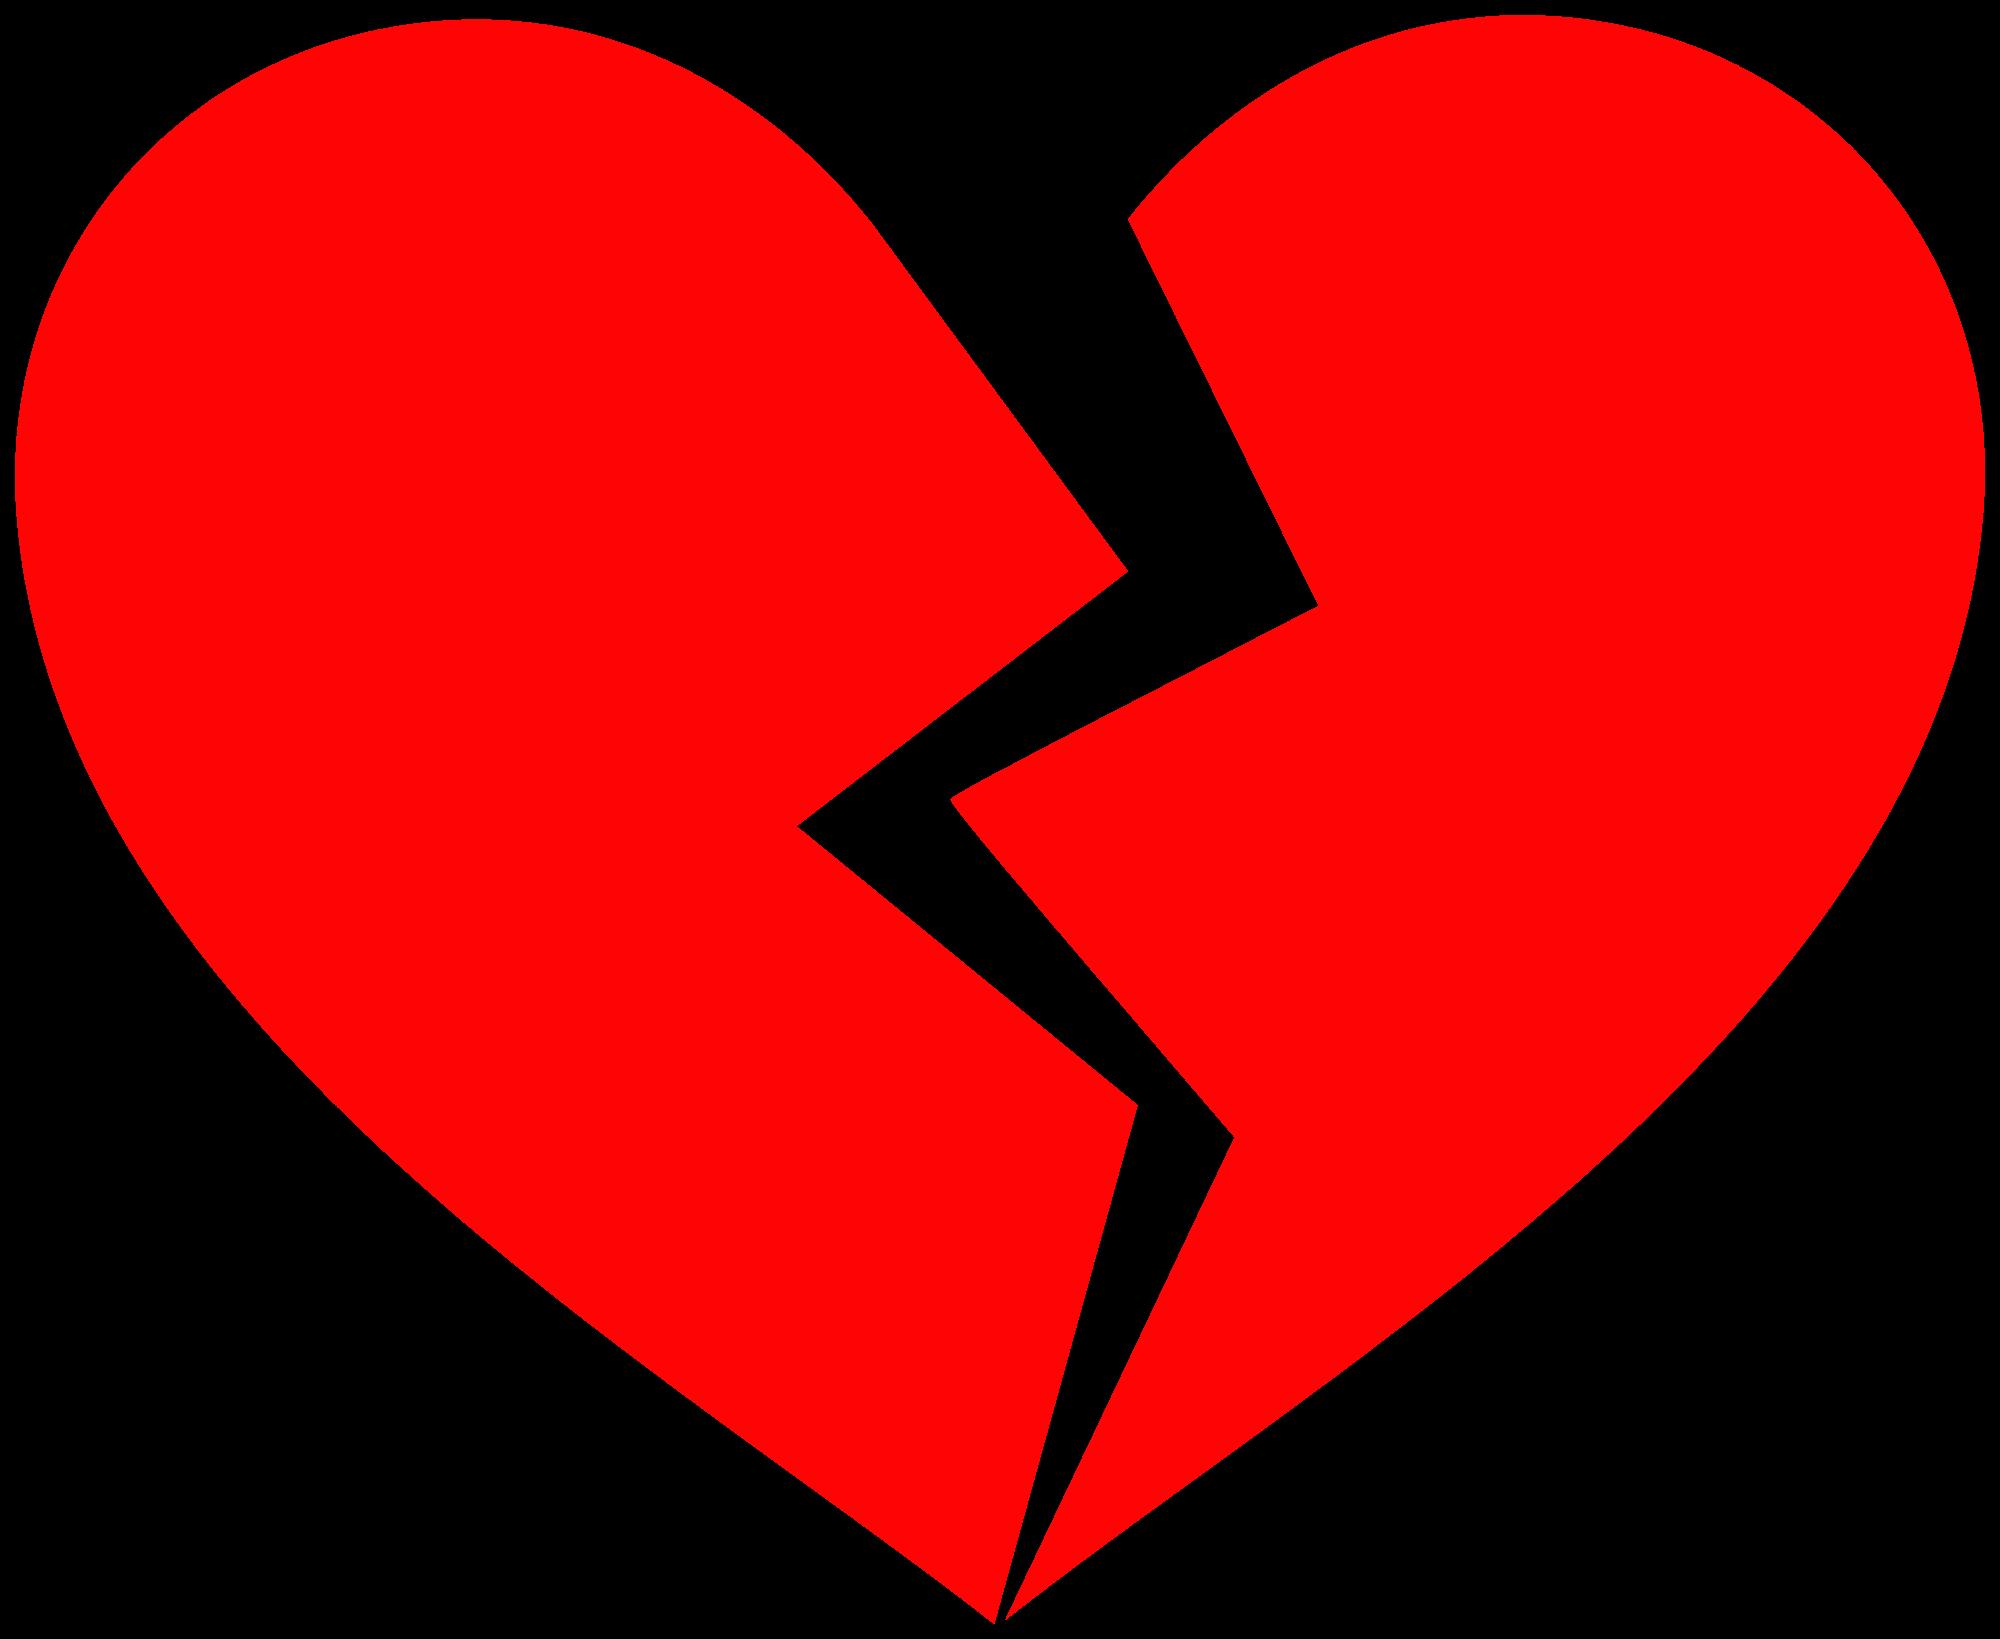 Free broken heart.